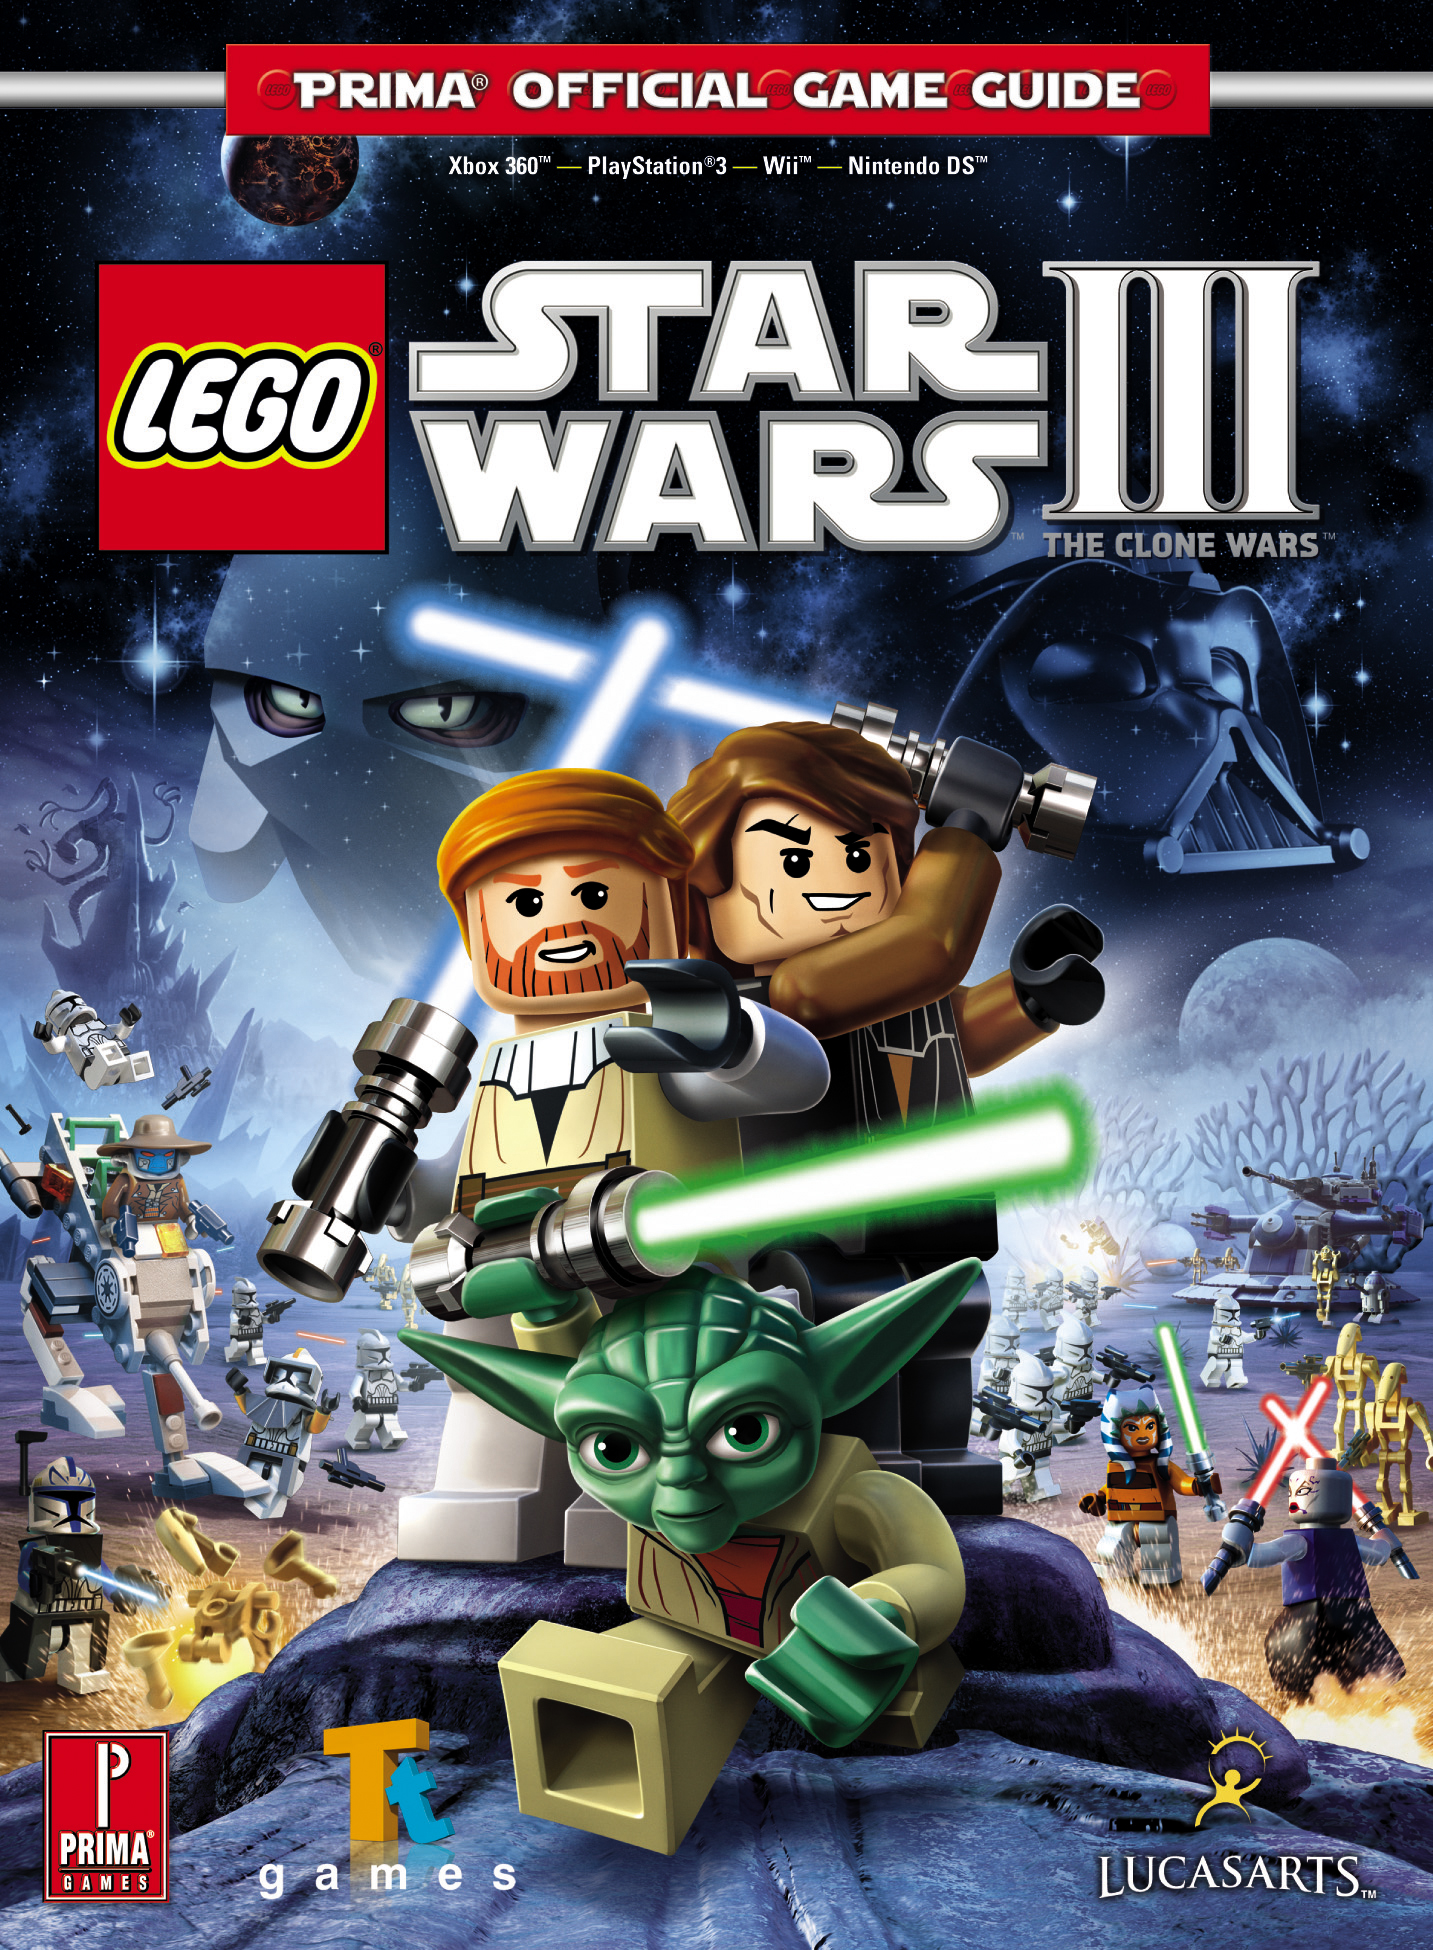 LEGO Star Wars III: The Clone Wars: Официальное игровое руководство Prima